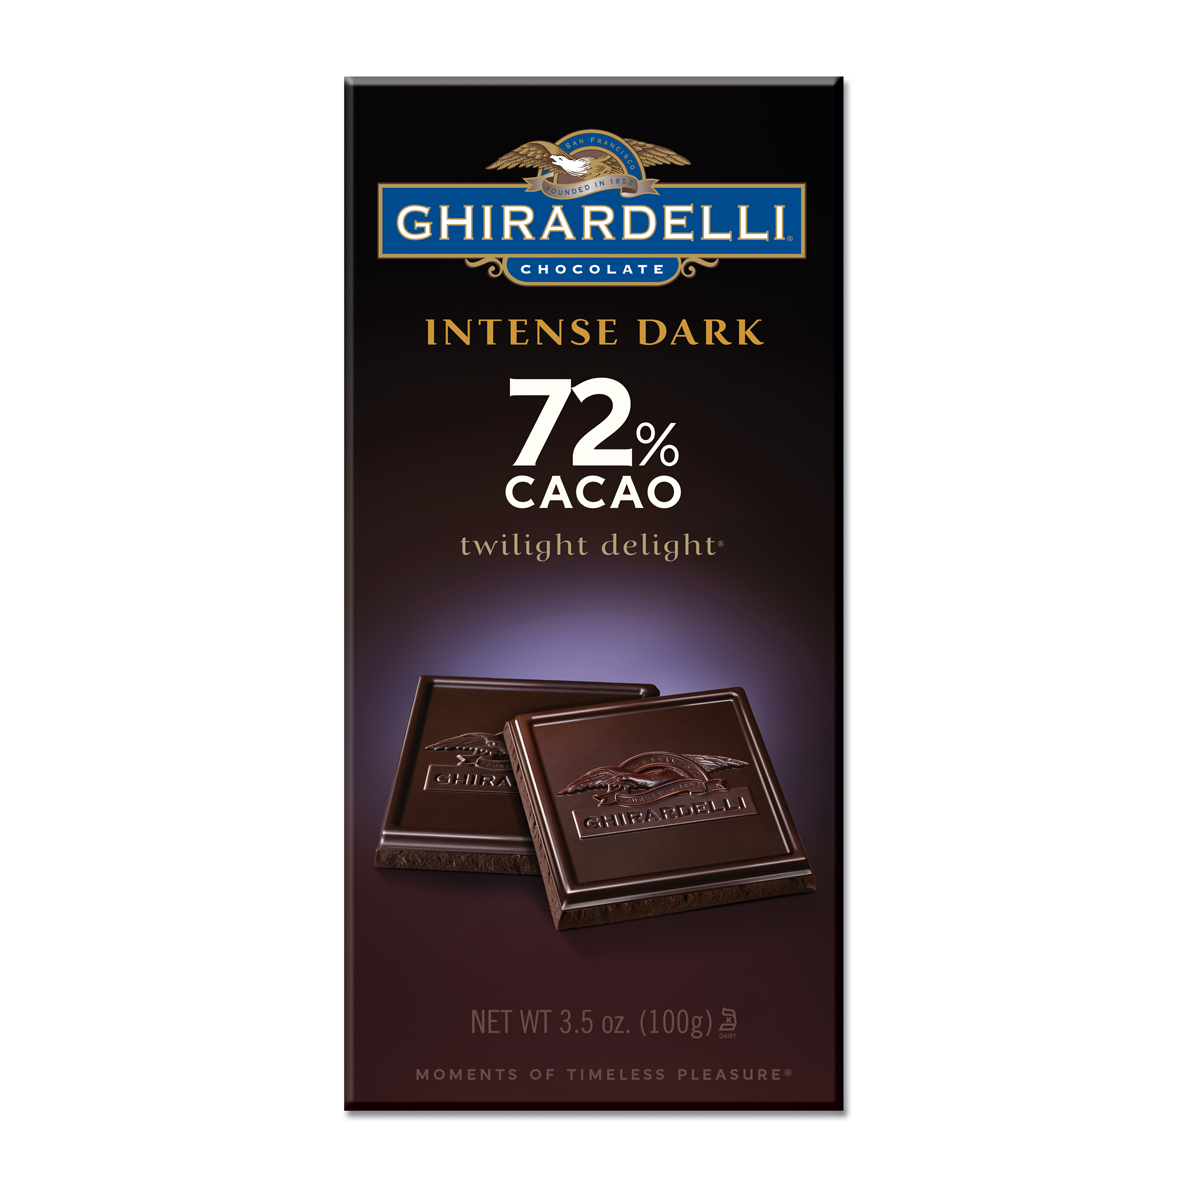 Ghirardelli Intense Dark Twilight Delight 72% Cacao Bar